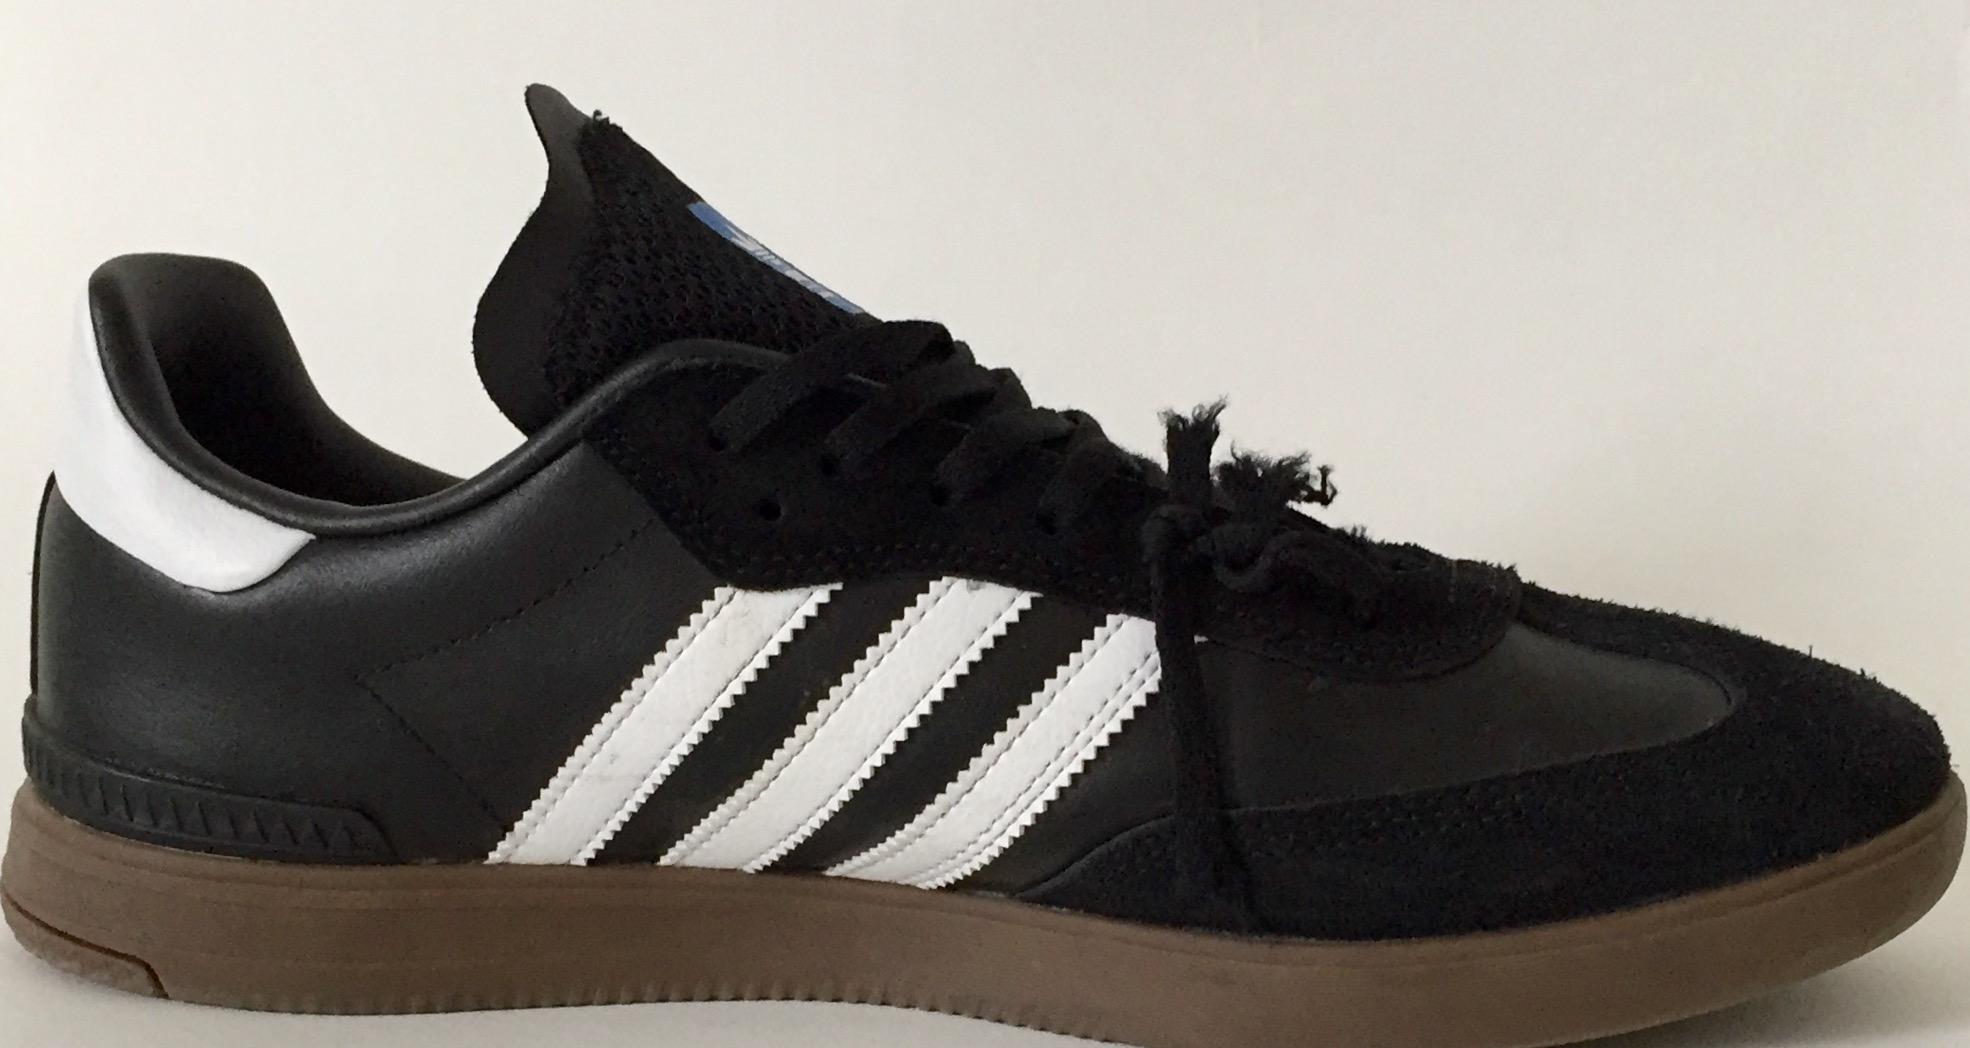 adidas Samba ADV - Weartested - detailed skate shoe reviews 522d00961